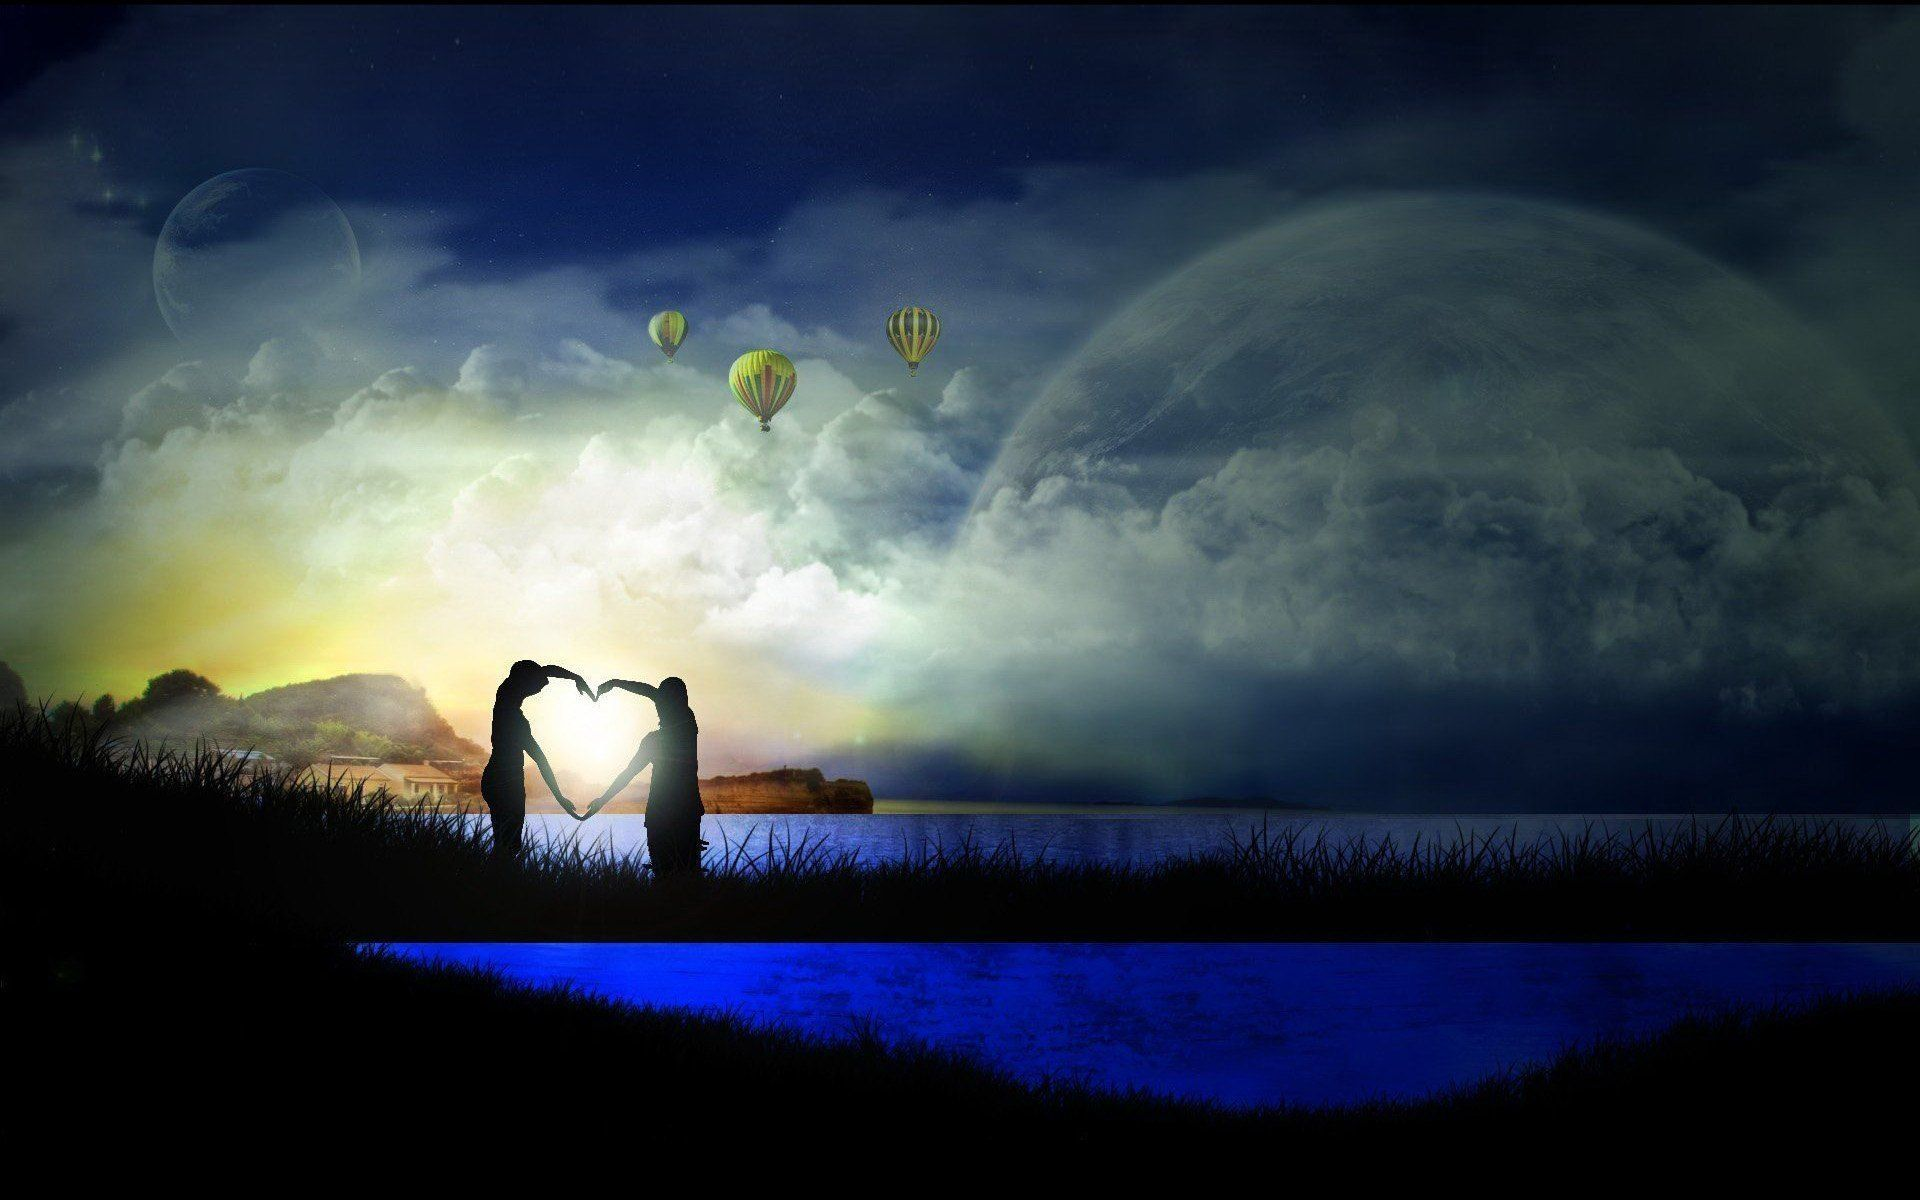 Download Cool Romantic Wallpaper Hd Download Cool Romantic